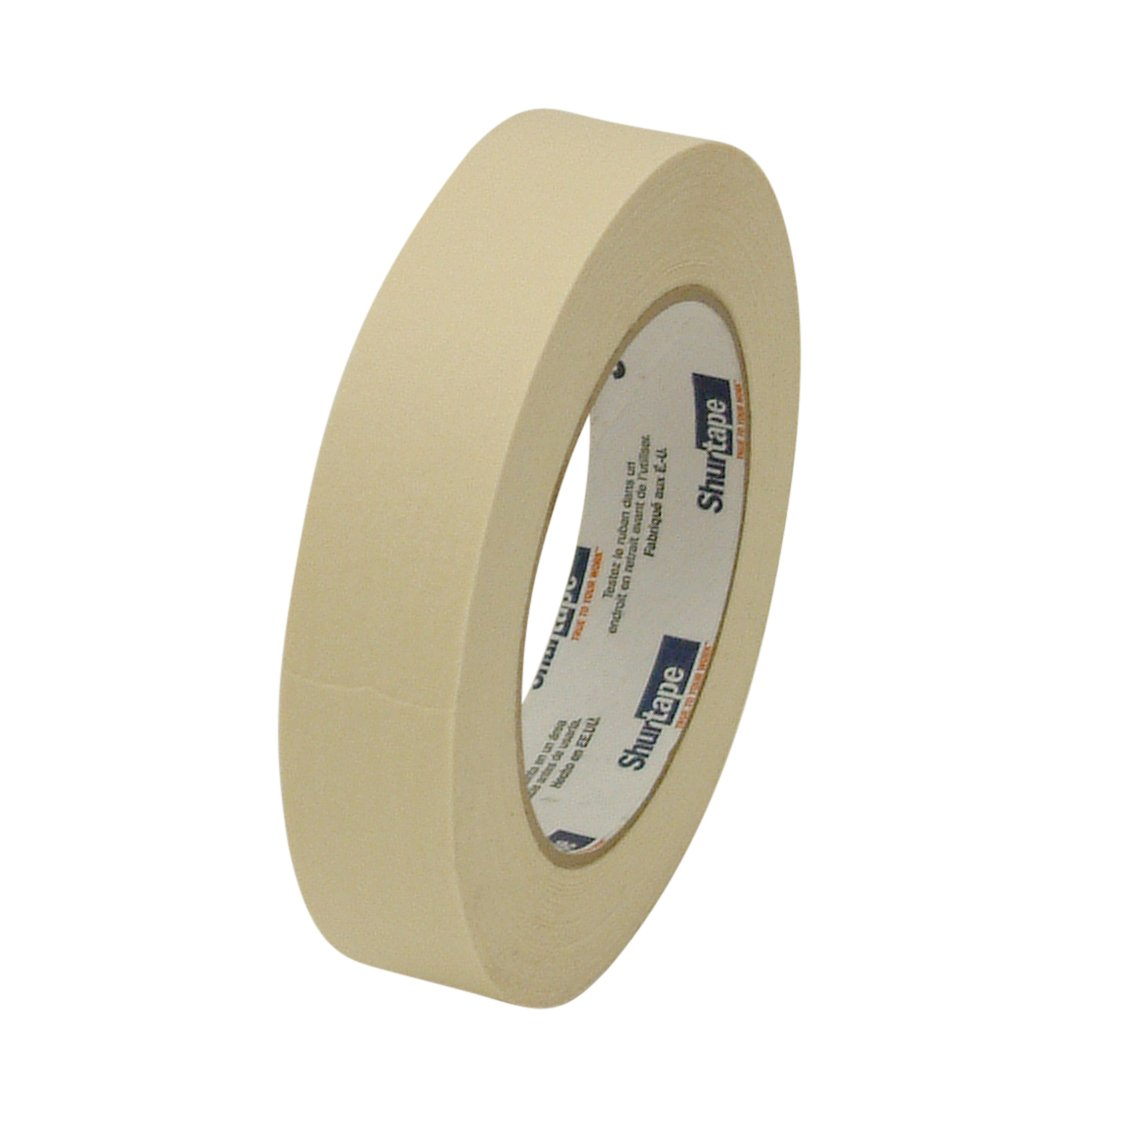 uxcell M13 E-Nut Wood Insert Interface Screws Hex Socket Nut Fittings 25 Pcs US-SA-AJD-104576